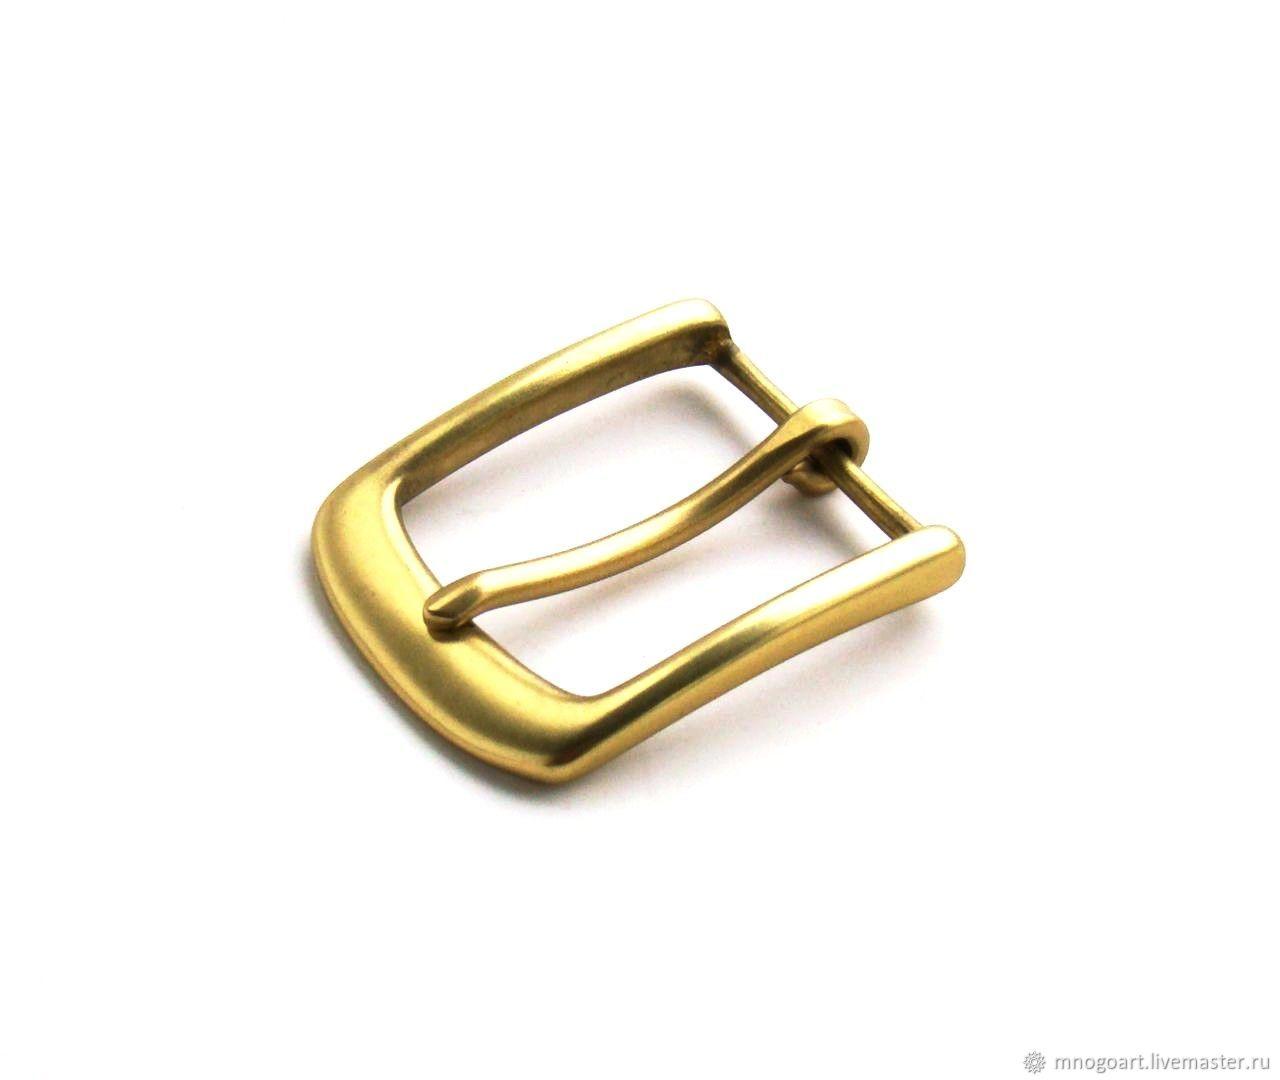 Пряжки для ремня латунь 40 мм, Фурнитура для шитья, Балабаново,  Фото №1